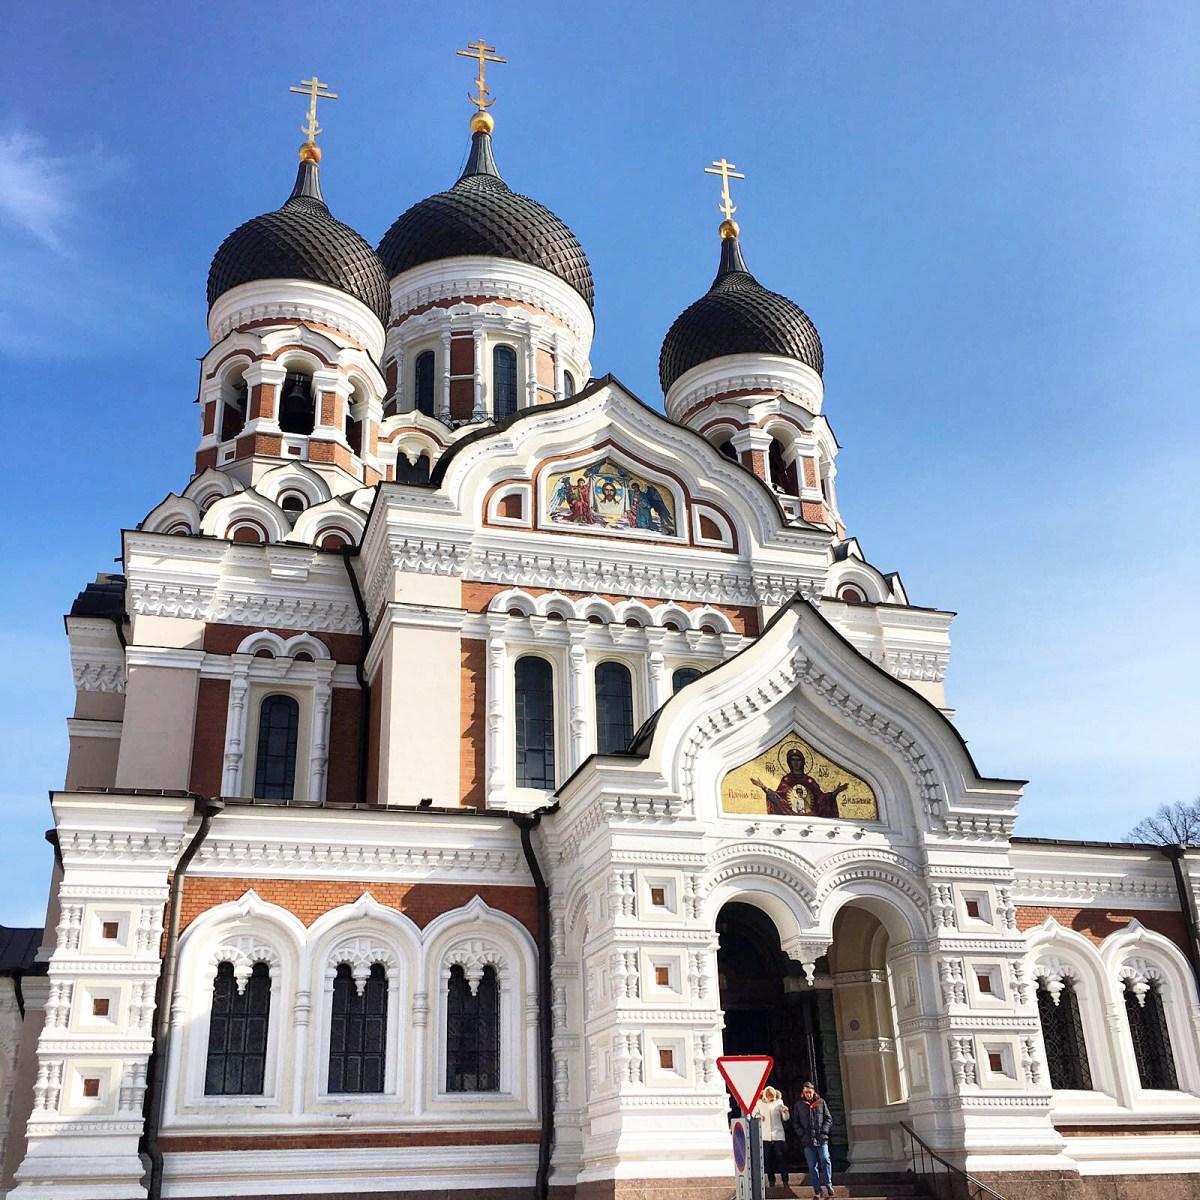 Discover Tallinn & Helsinki